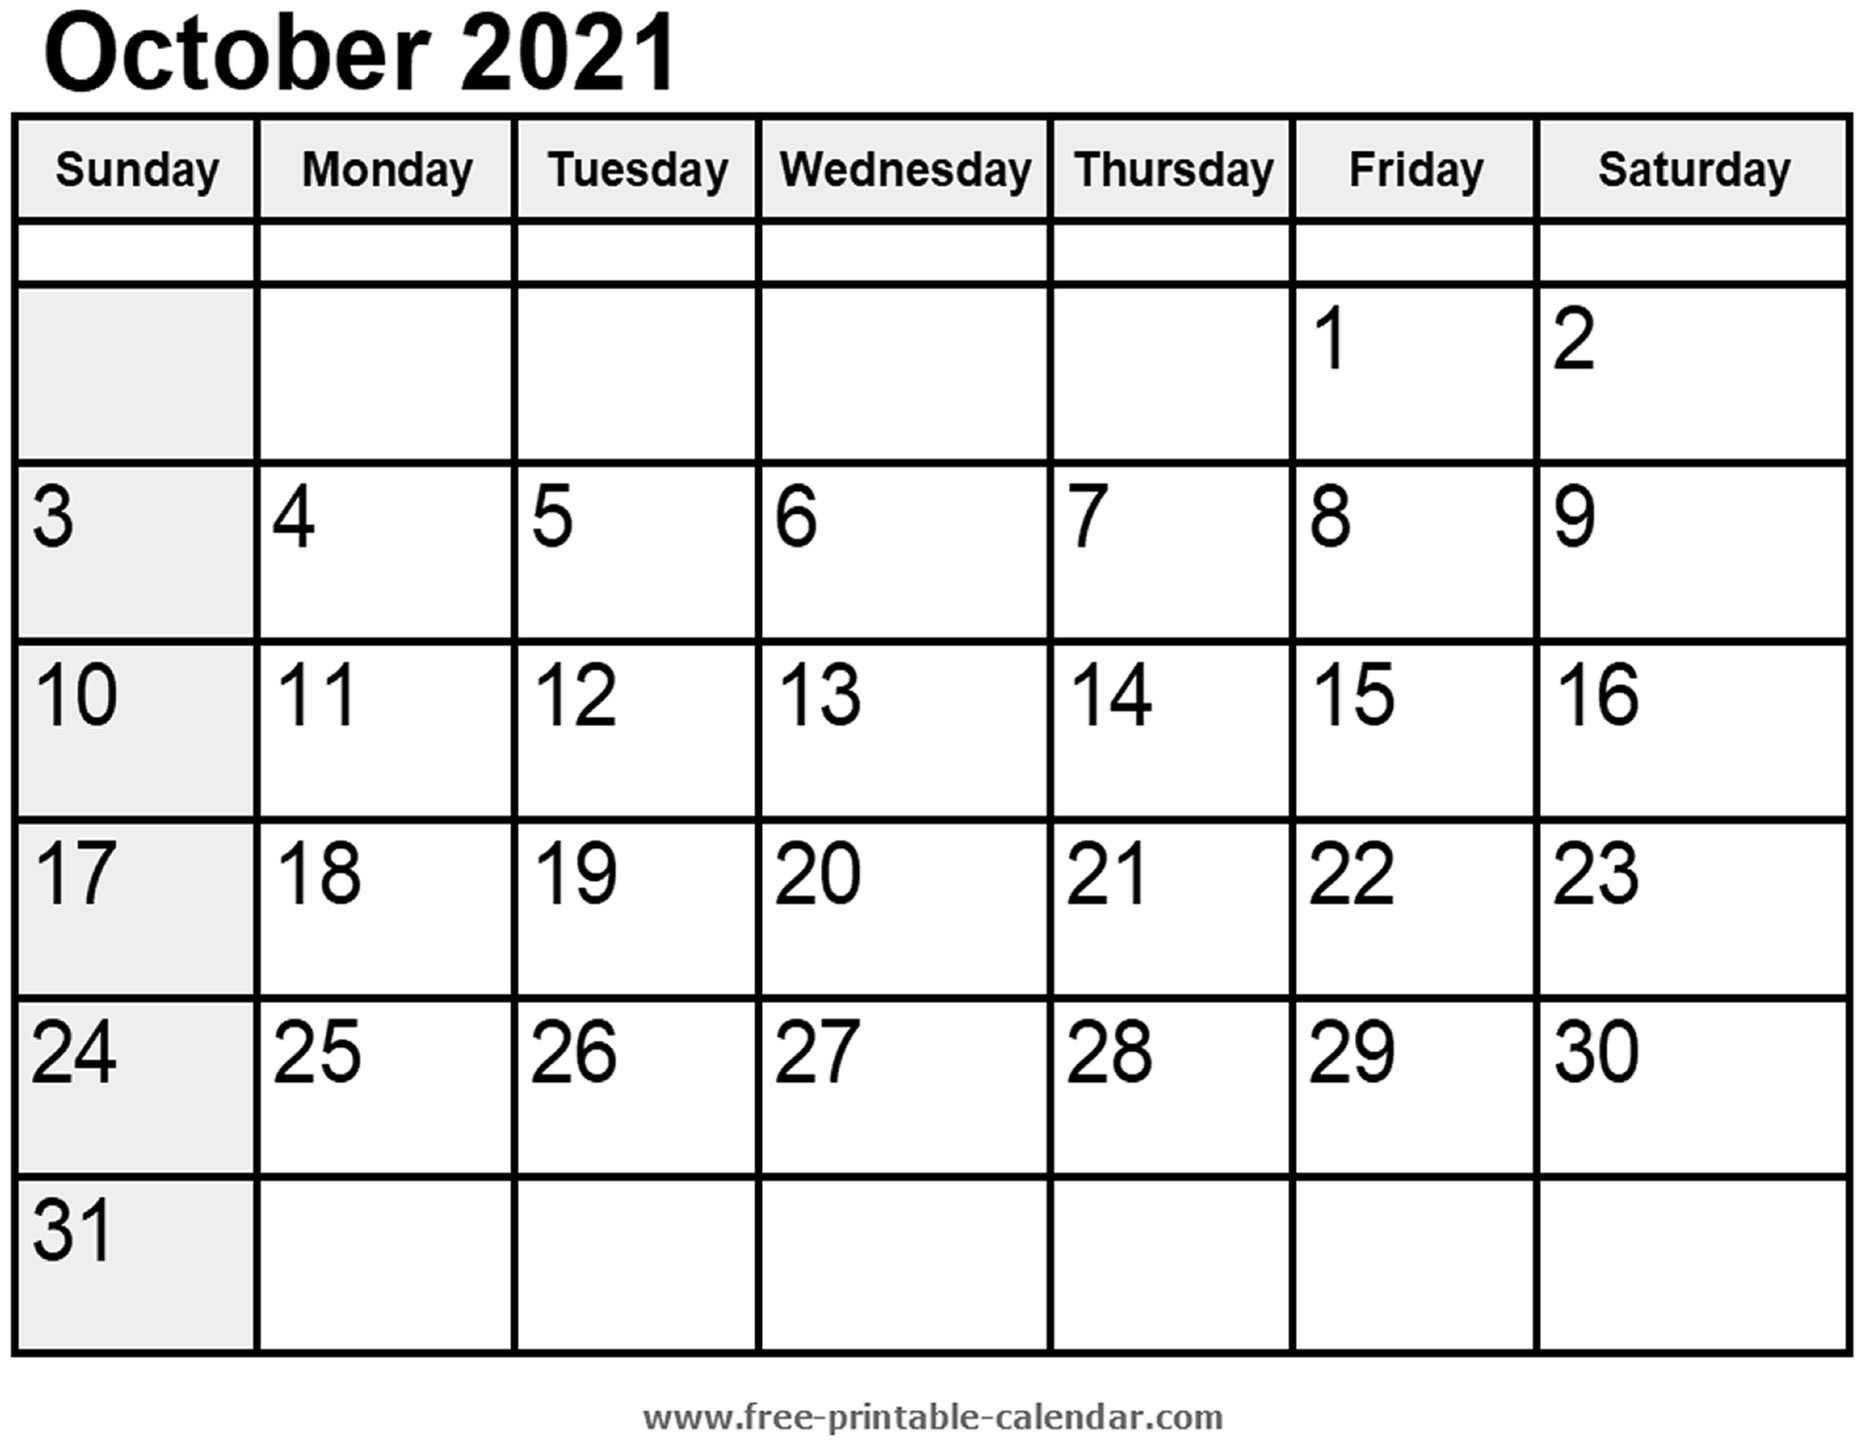 2021 Printable Calendar From October Thru December   Calendar Printables Free Blank October 2020 To February 2021 Calendar